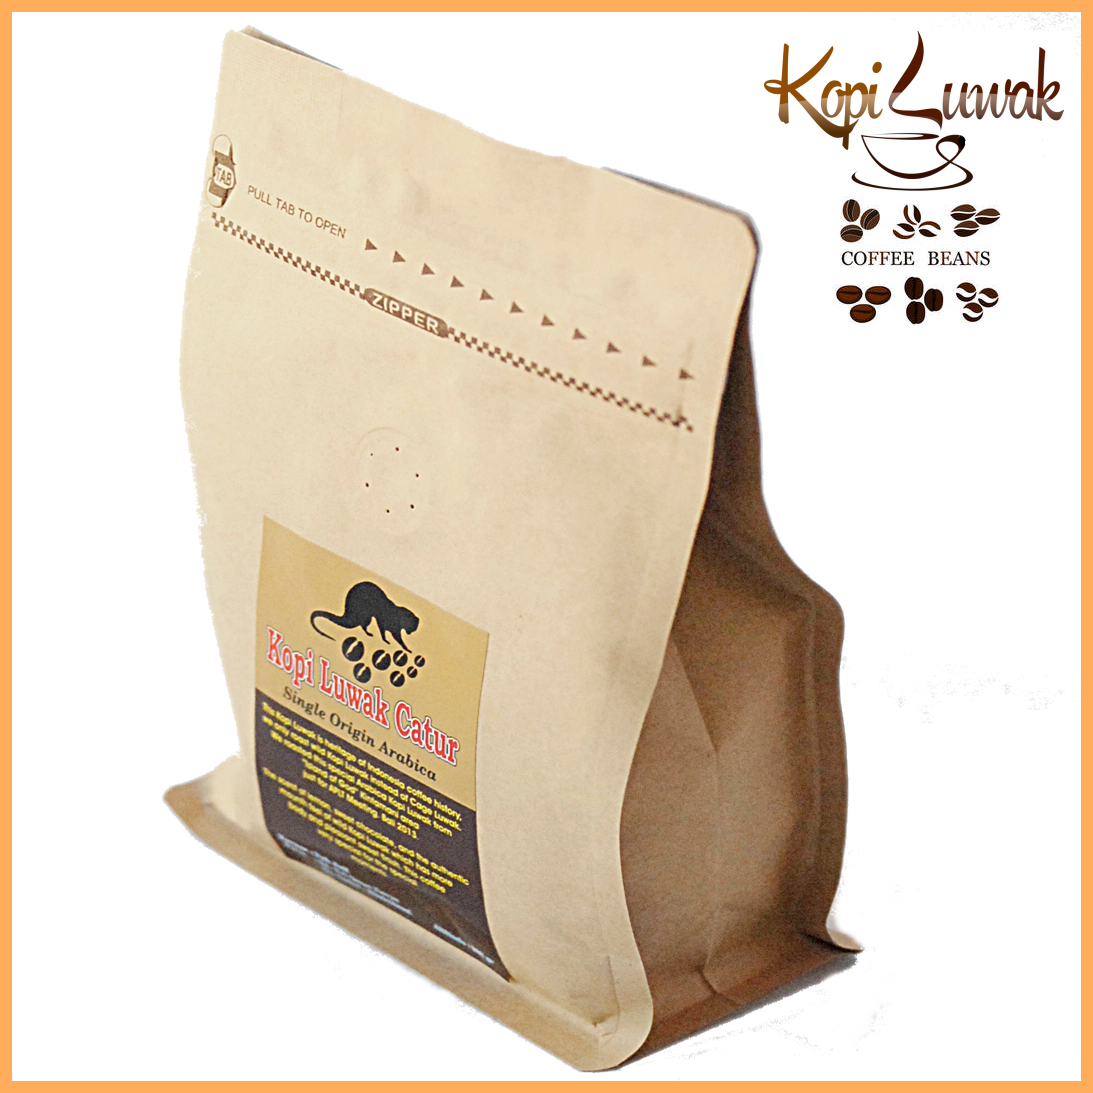 The Rarest Coffee Kopi Luwak